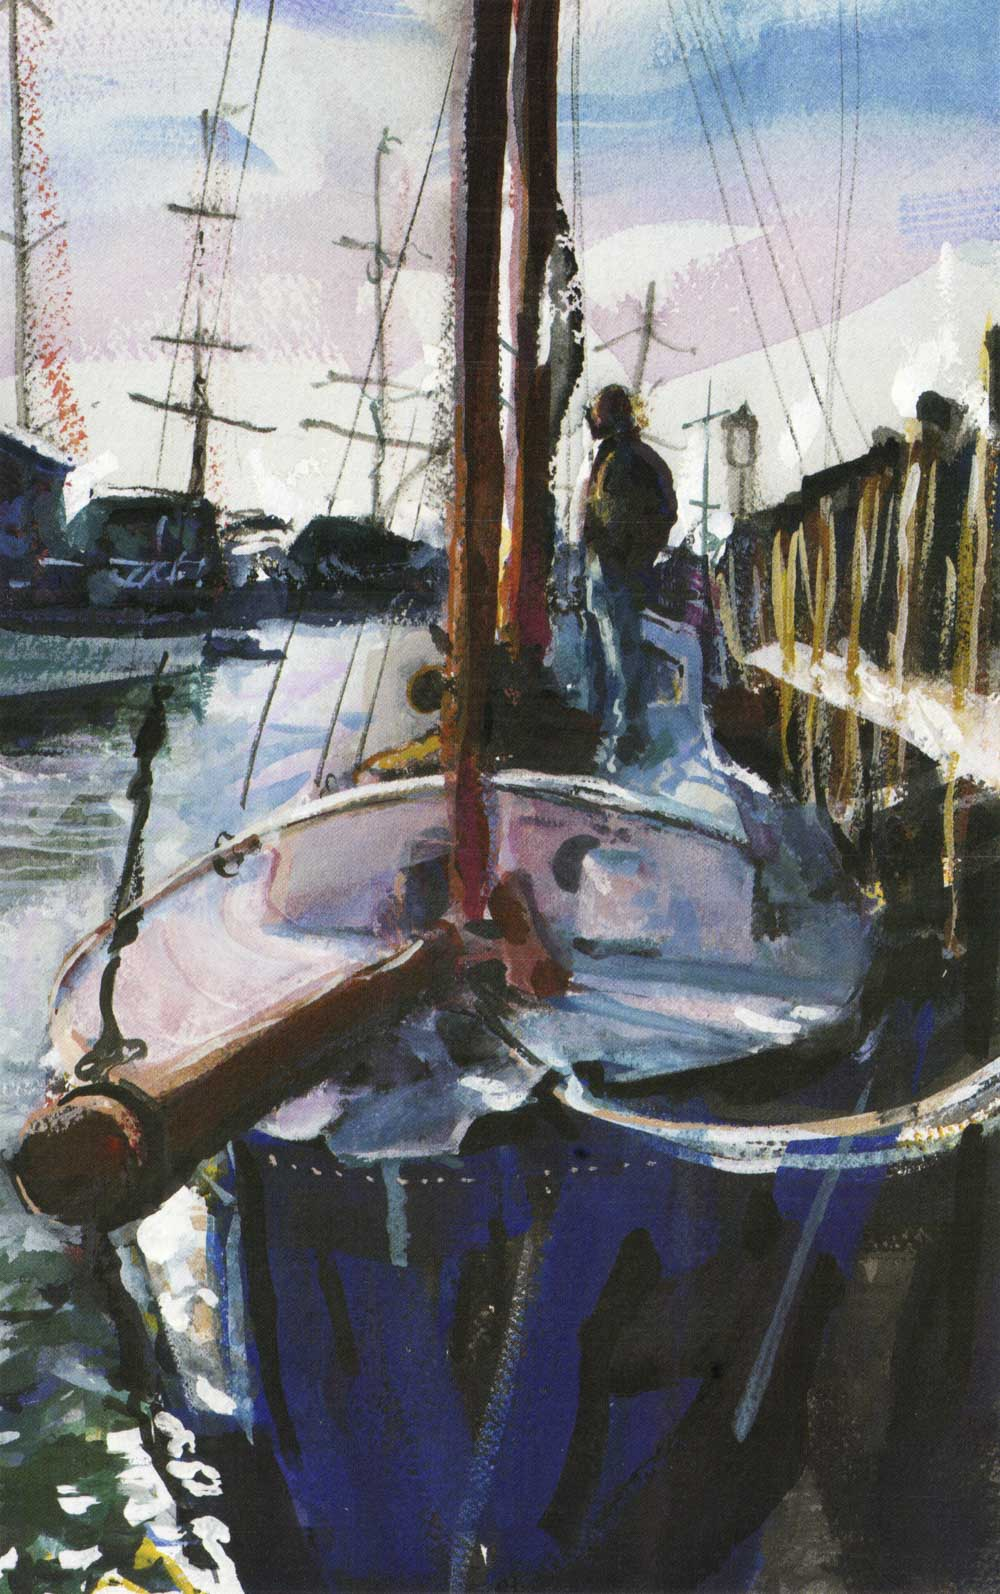 Schooner on Recovery, Bowen's Wharf, Winter 1998